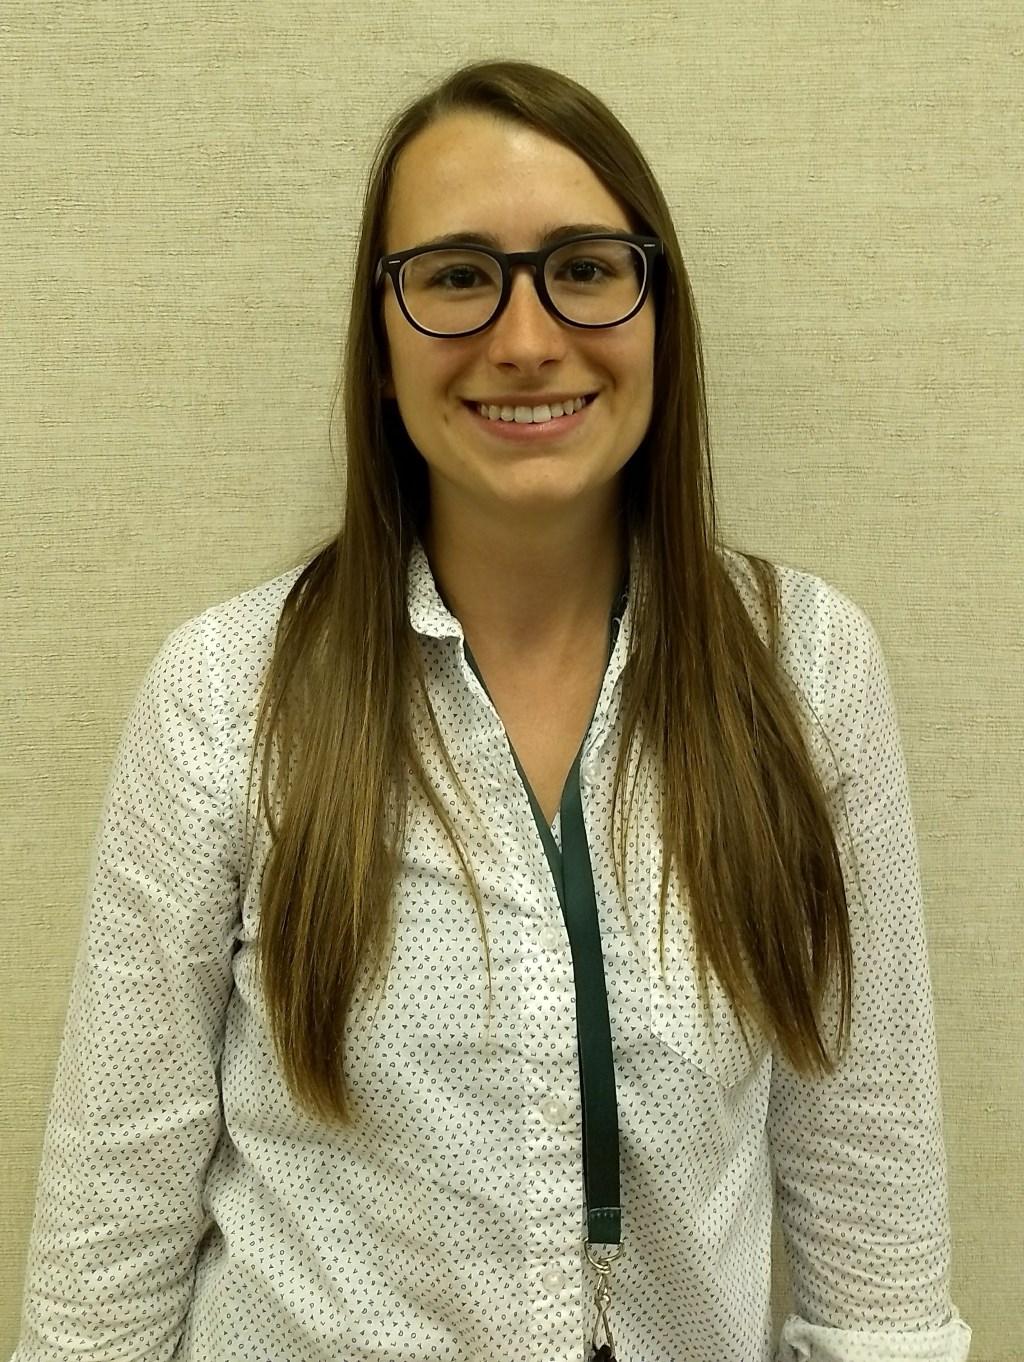 Sarah Bregant. Photo courtesy of the Northwest Side Community Development Corporation.